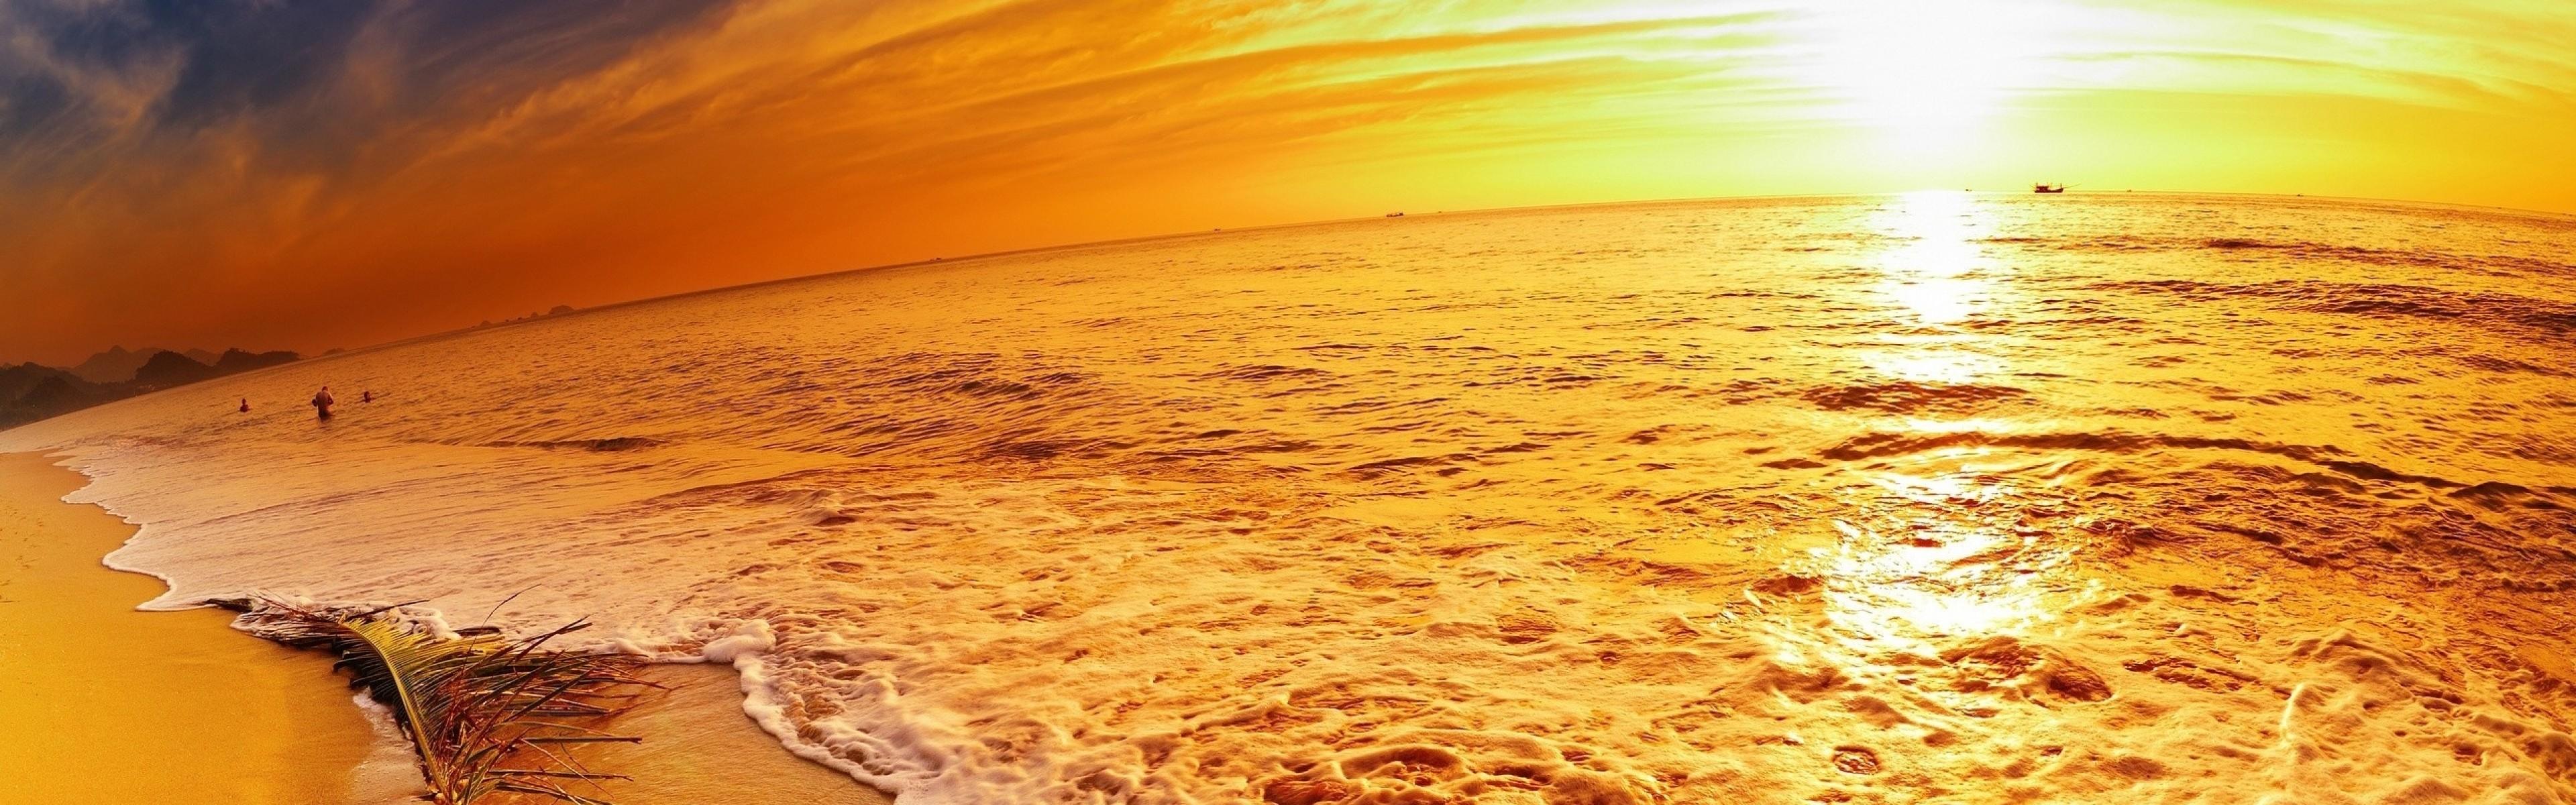 Wallpaper coast, sea, decline, branch, palm tree, sand, beach